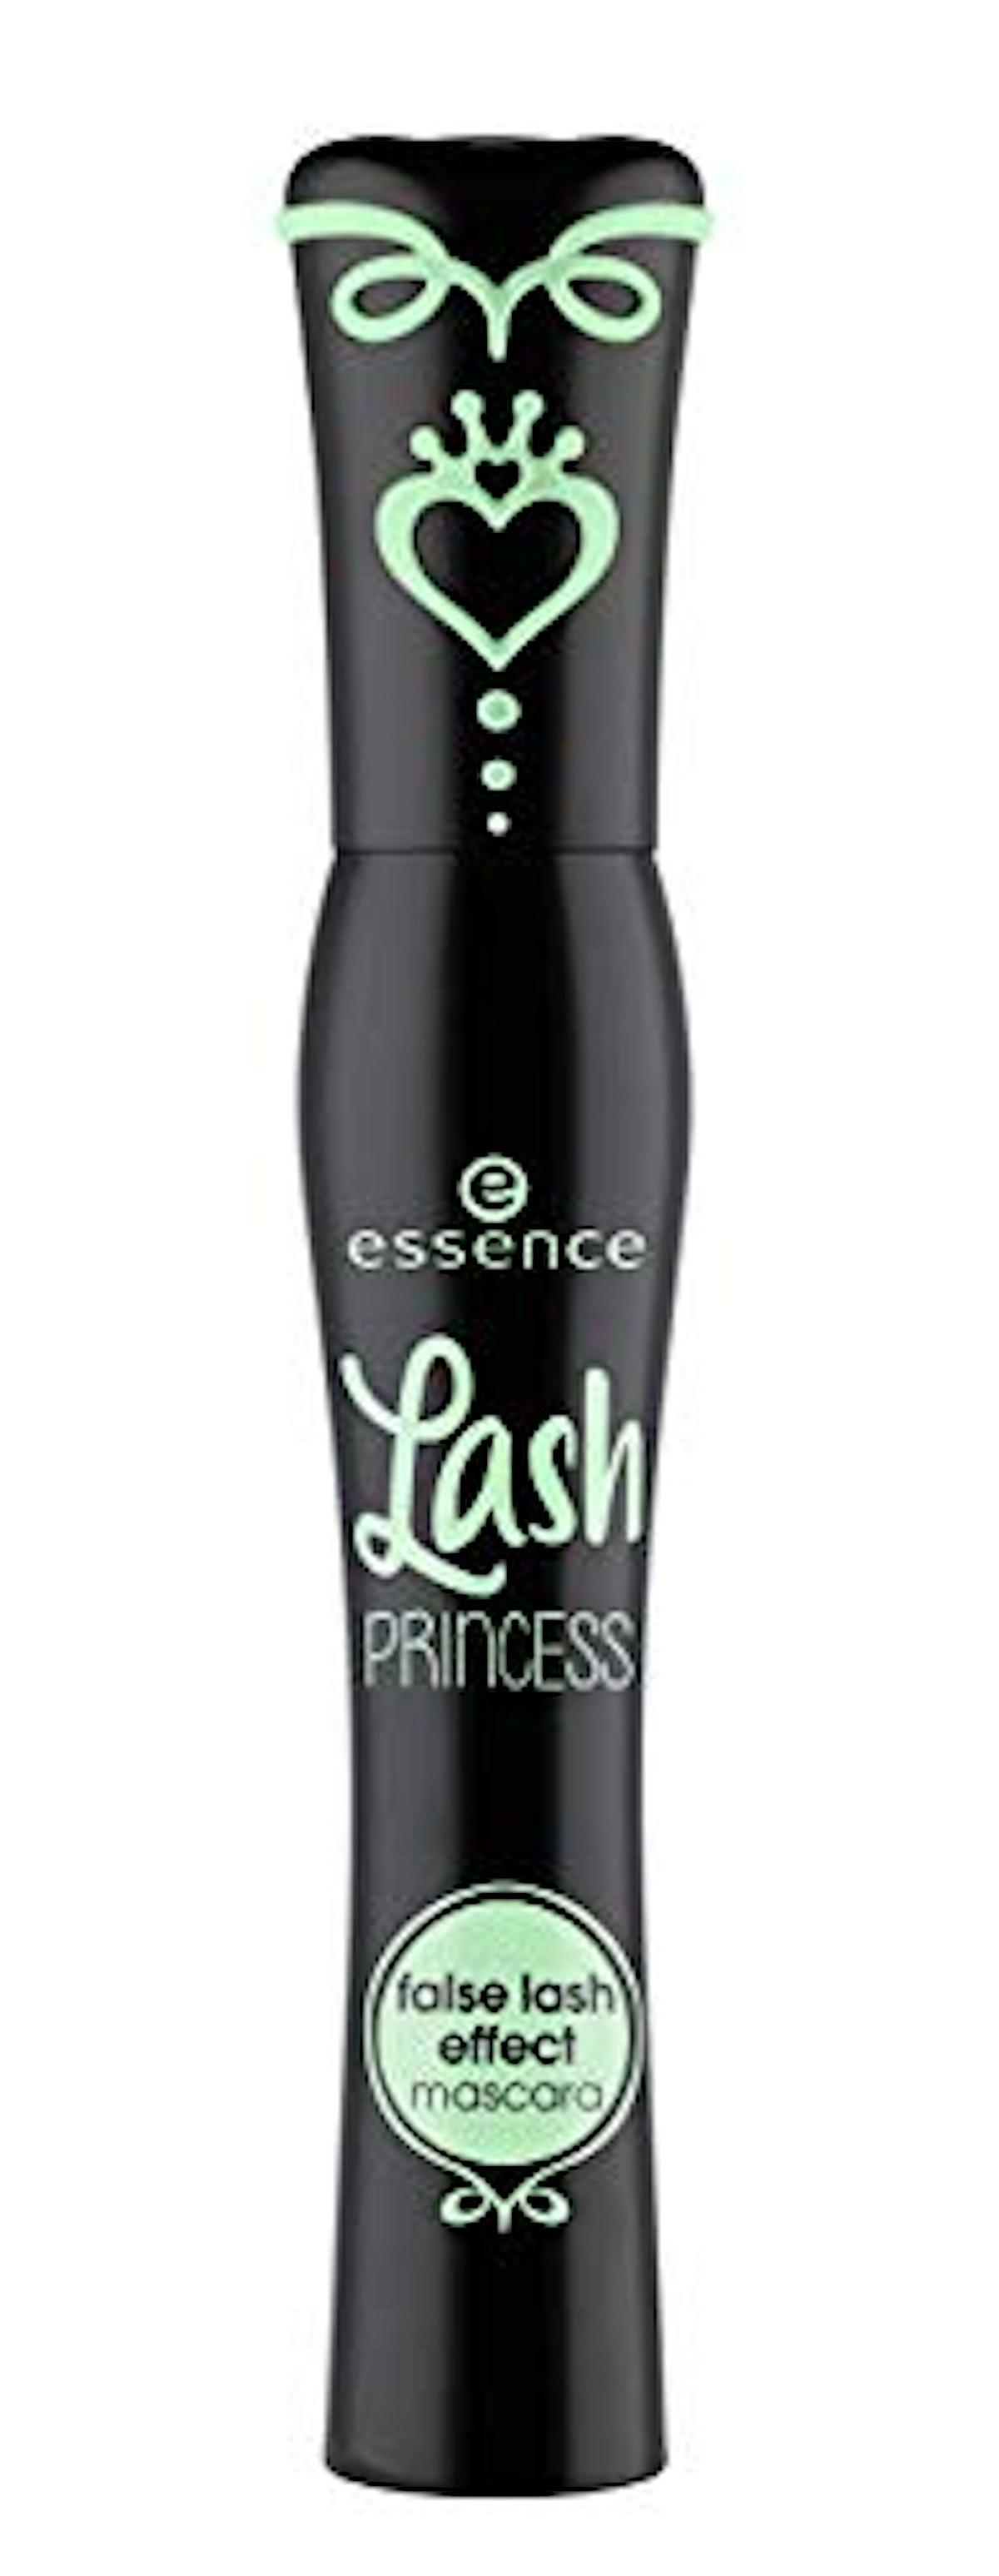 essence Lash Princess Mascara